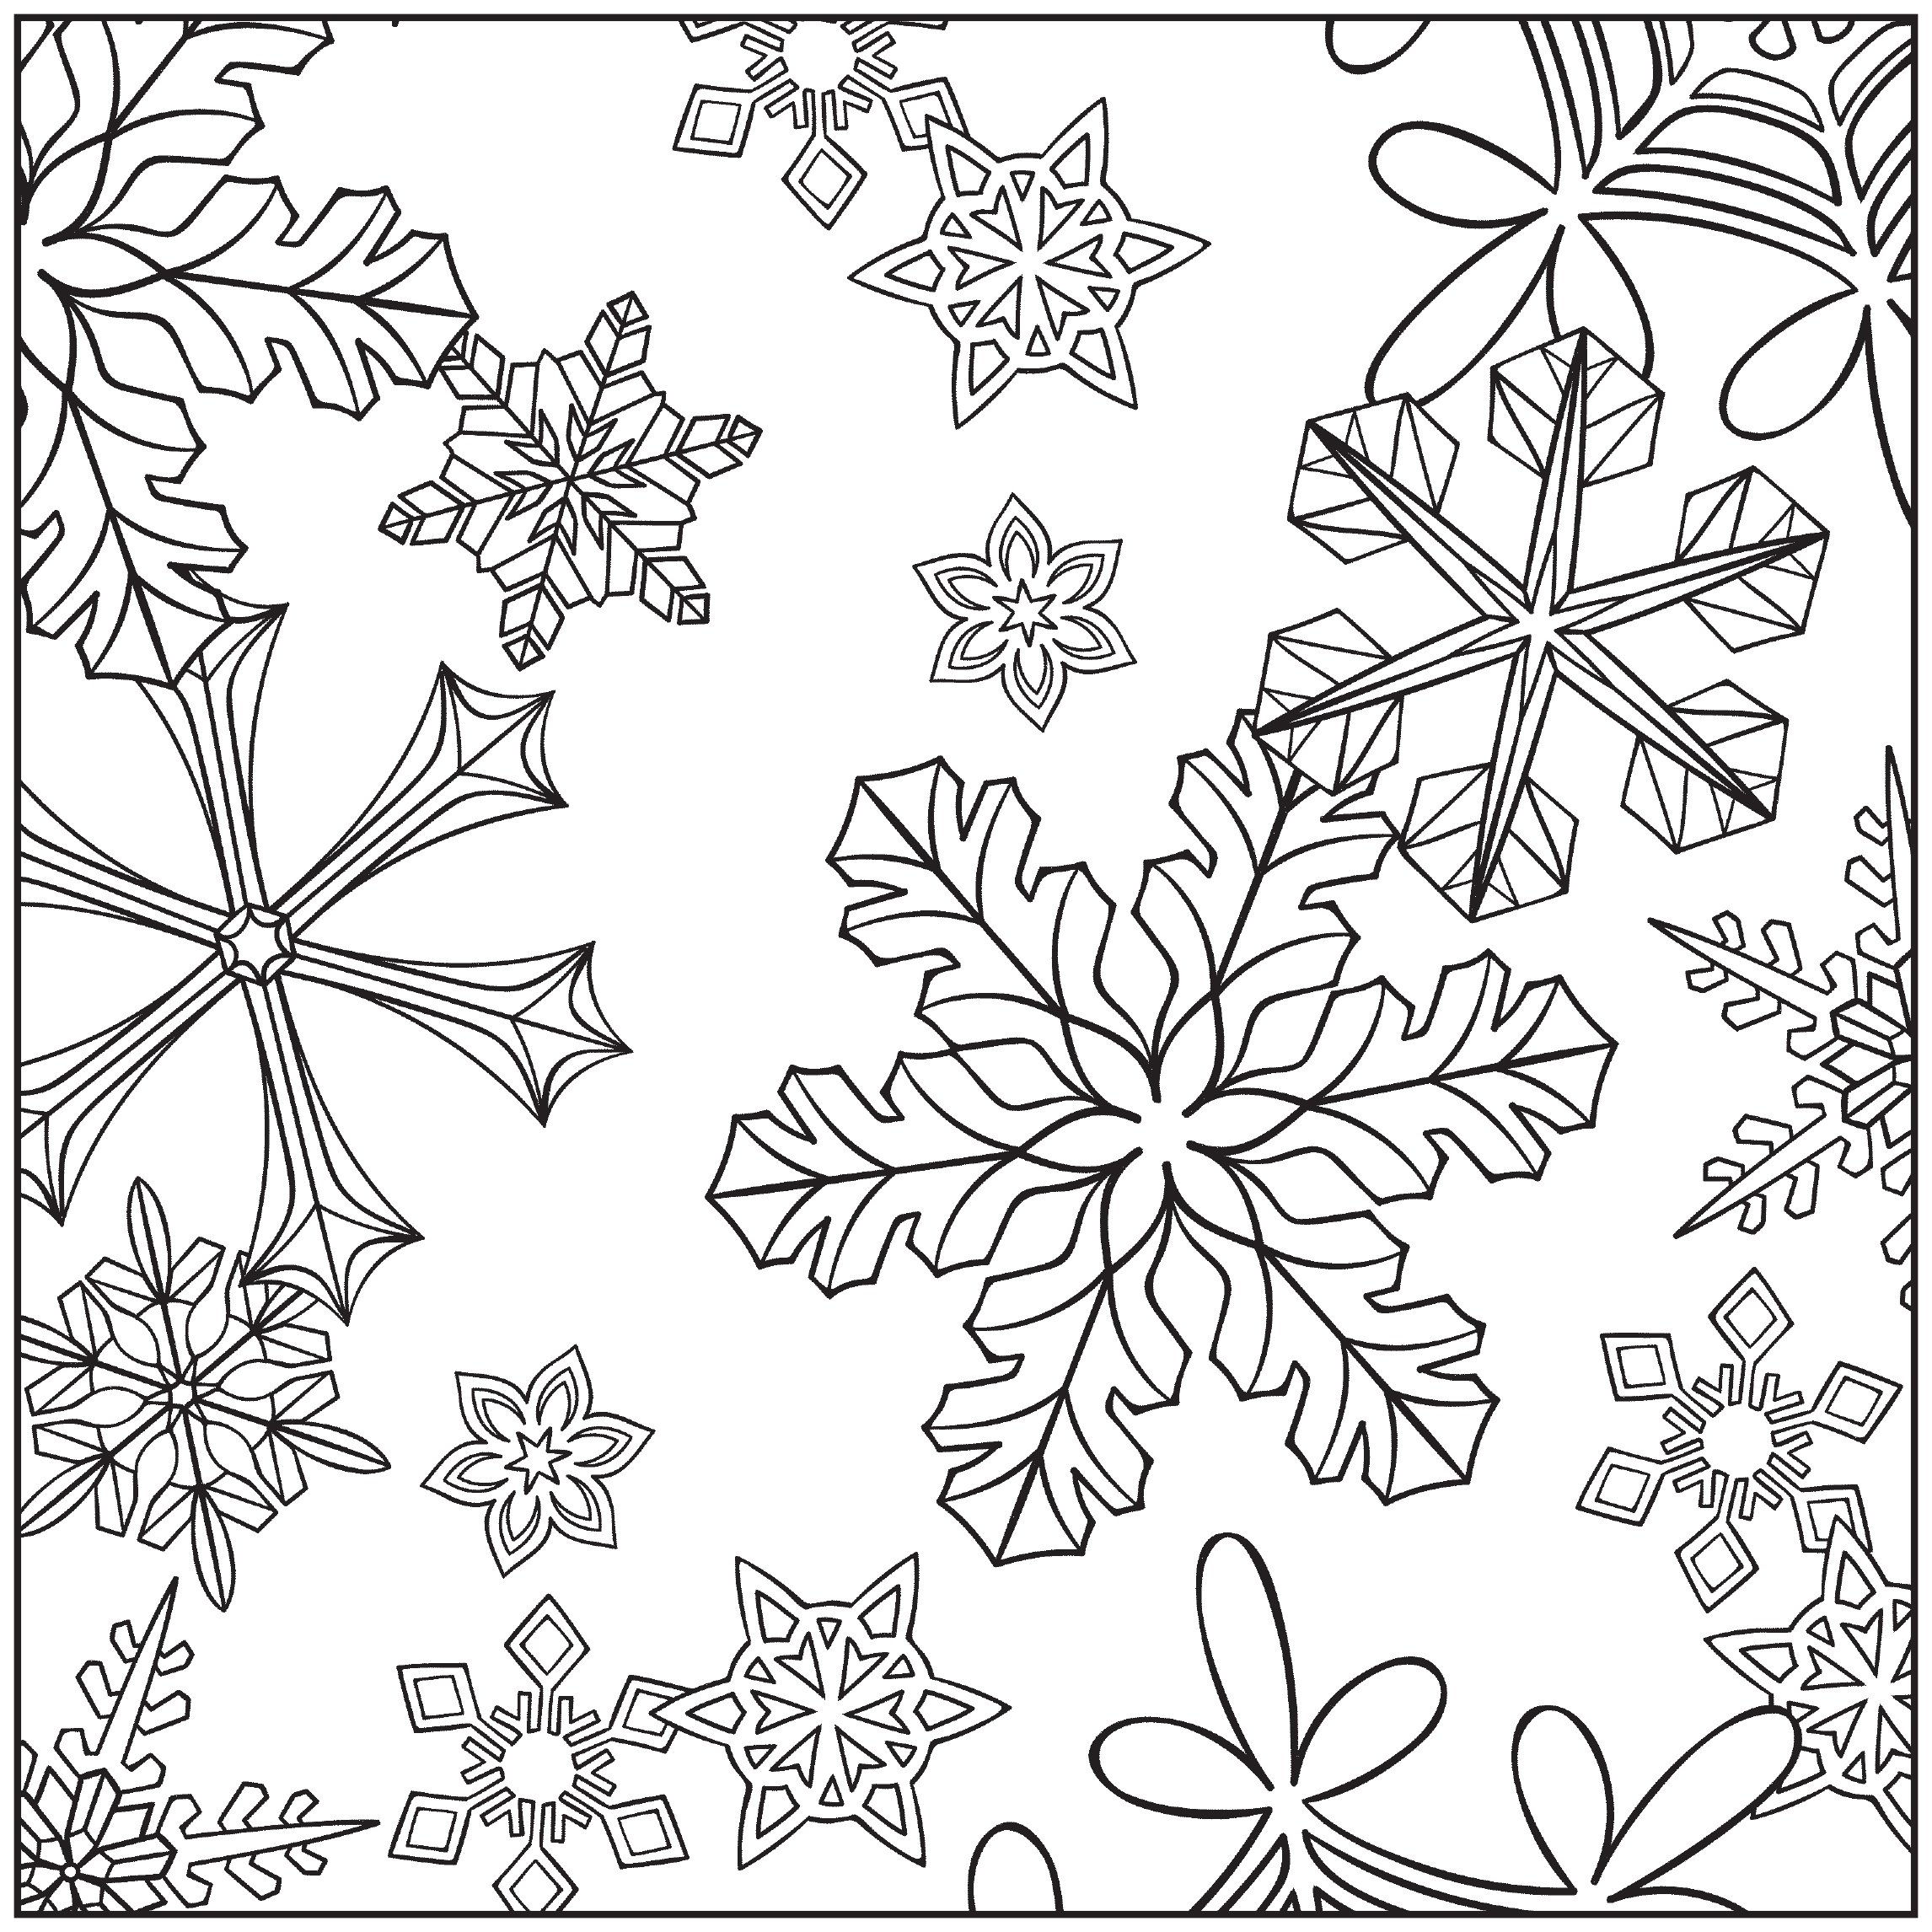 Amazon.com: Winter Wonderland Adult Coloring Book With Bonus